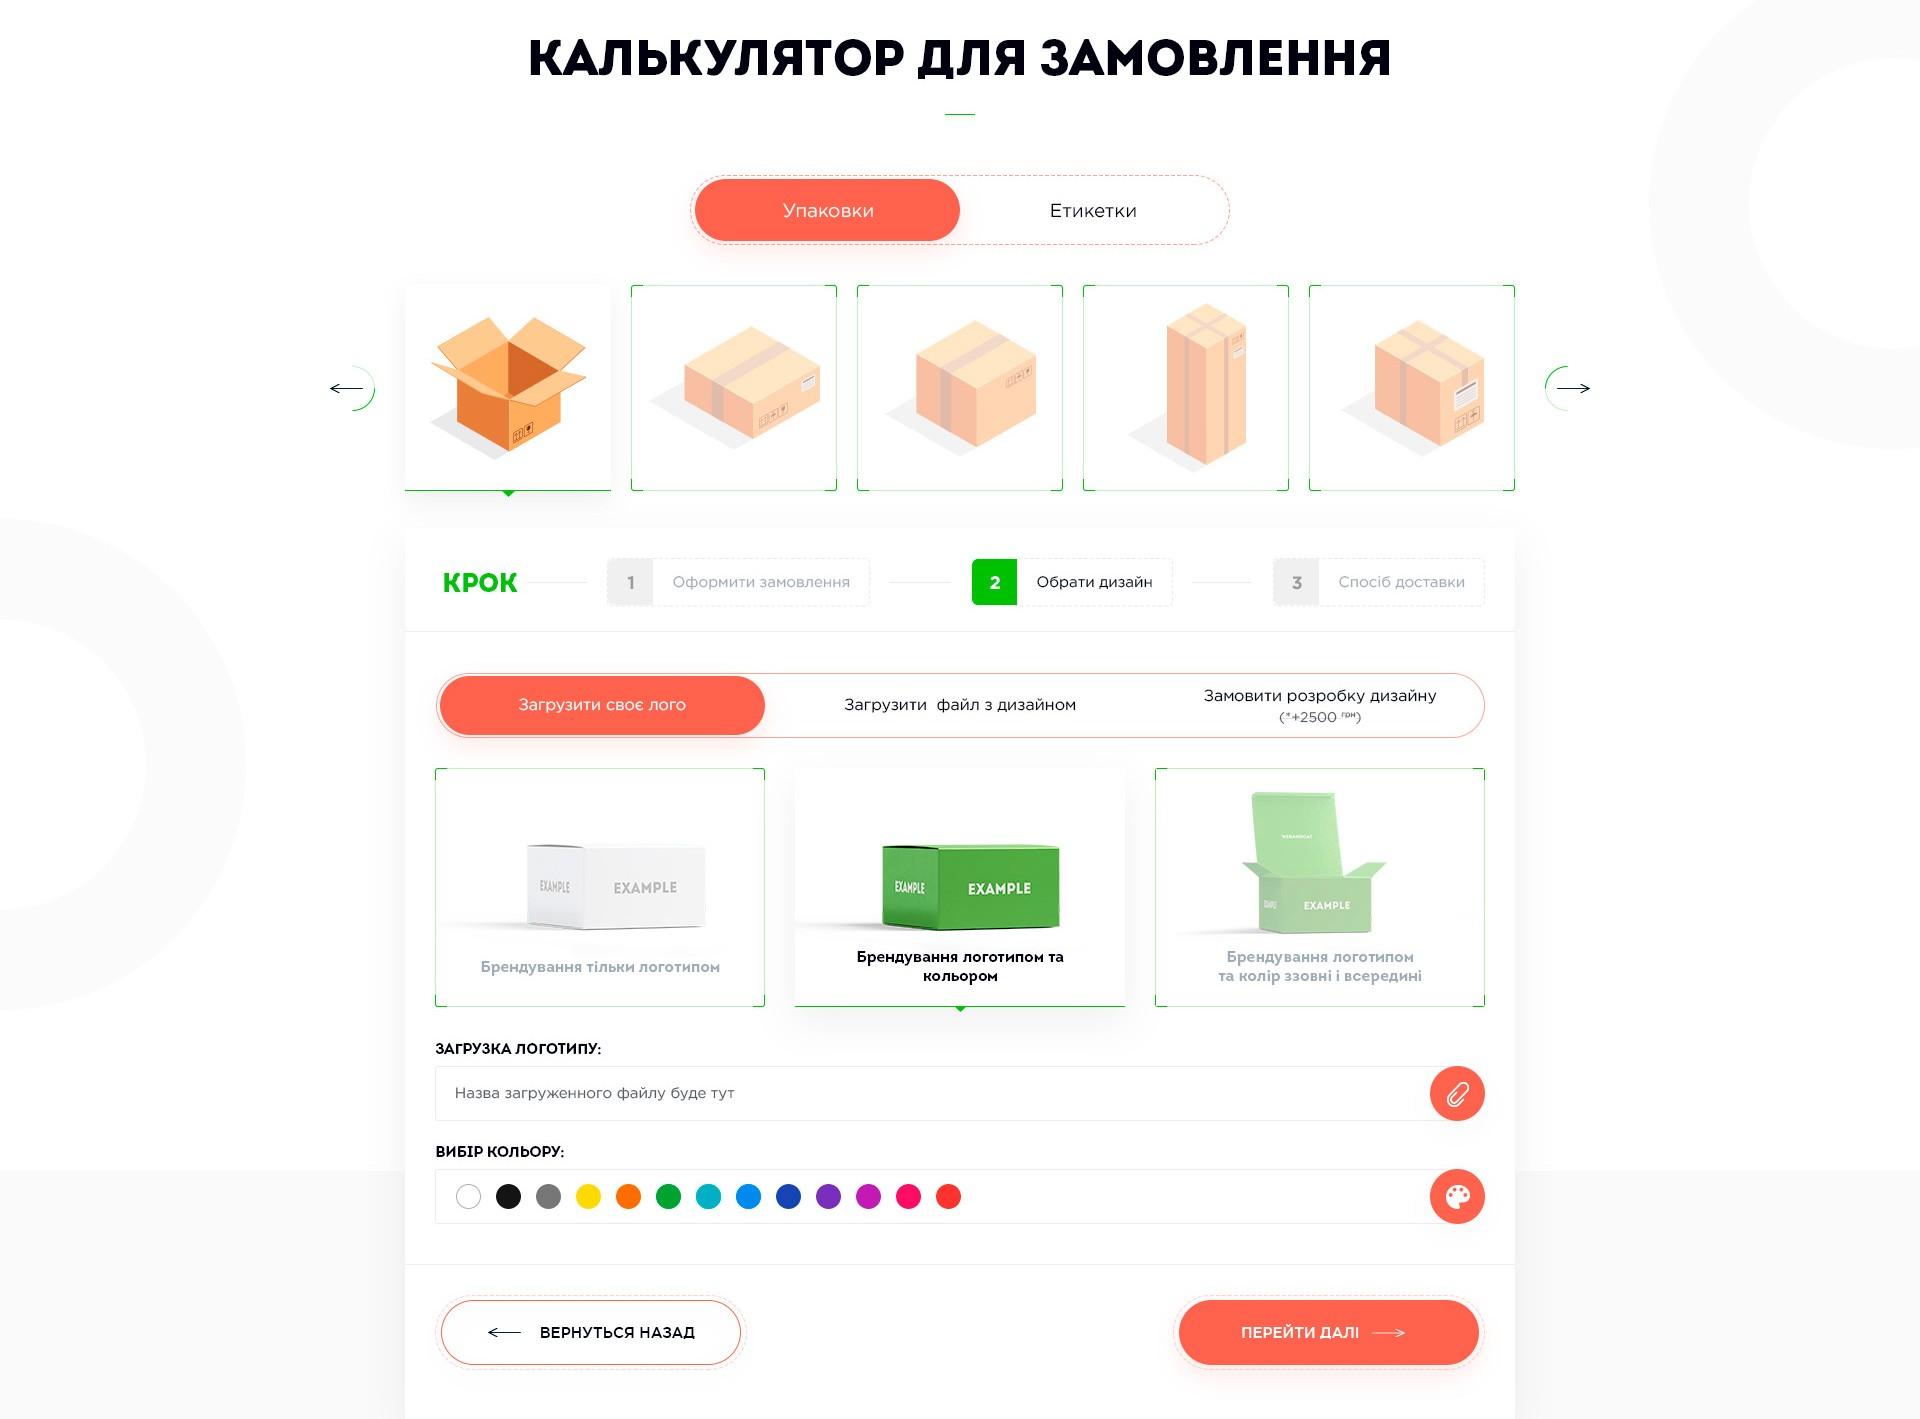 Upakovka_Tab_02.1_Calculator_0.`1